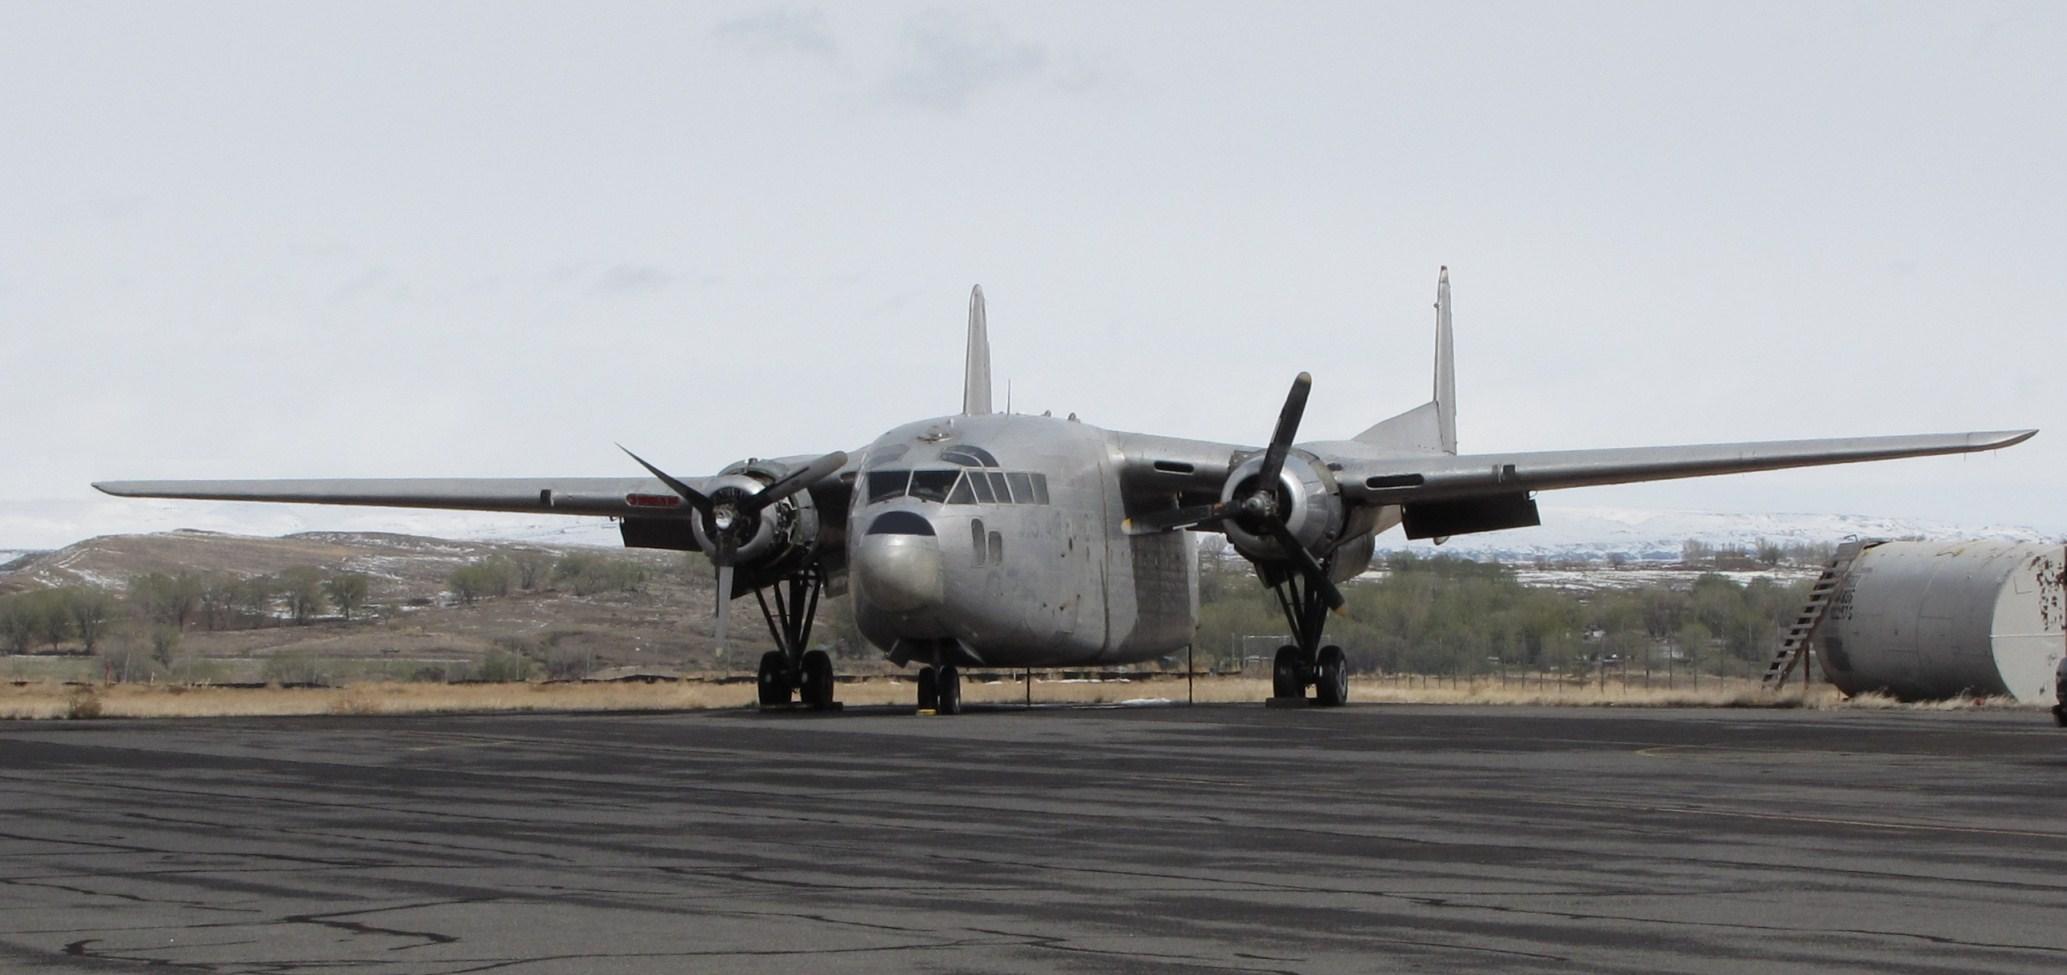 Description Fairchild C-119 Boxcar, Greybull Airport, Wyoming.jpg